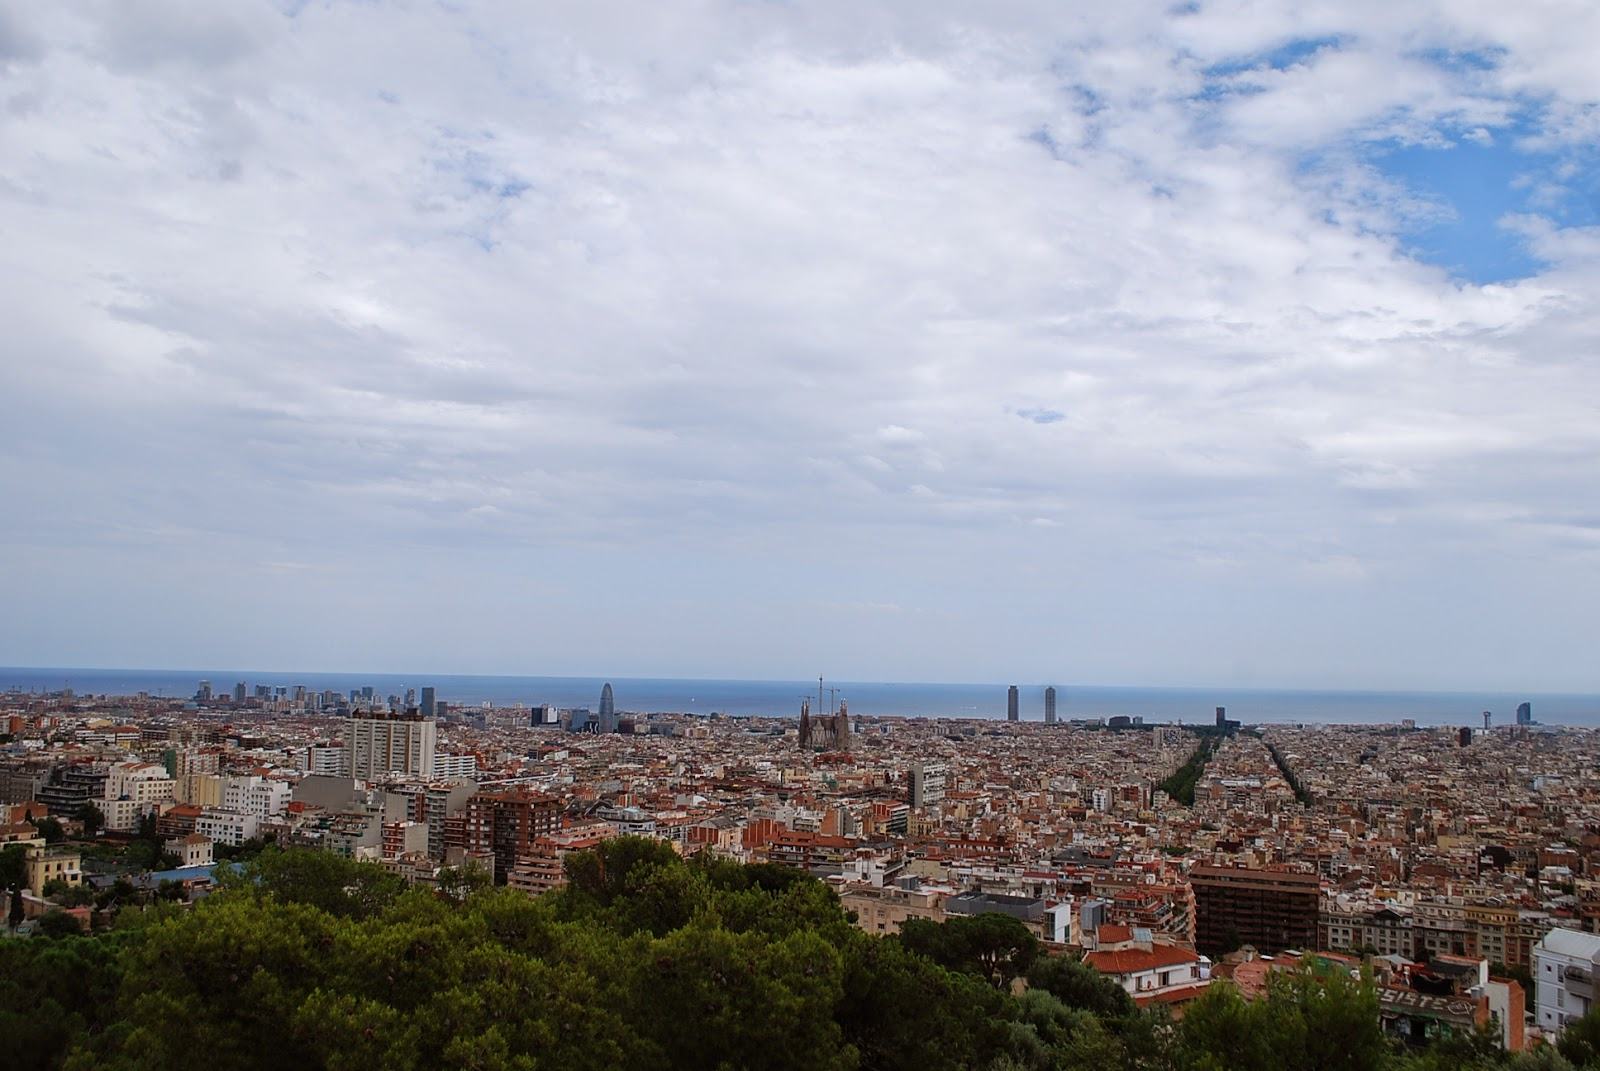 Вид с парка на Гуэля на Барселону. Parque Güell, Barcelona, Catalonia, Spain